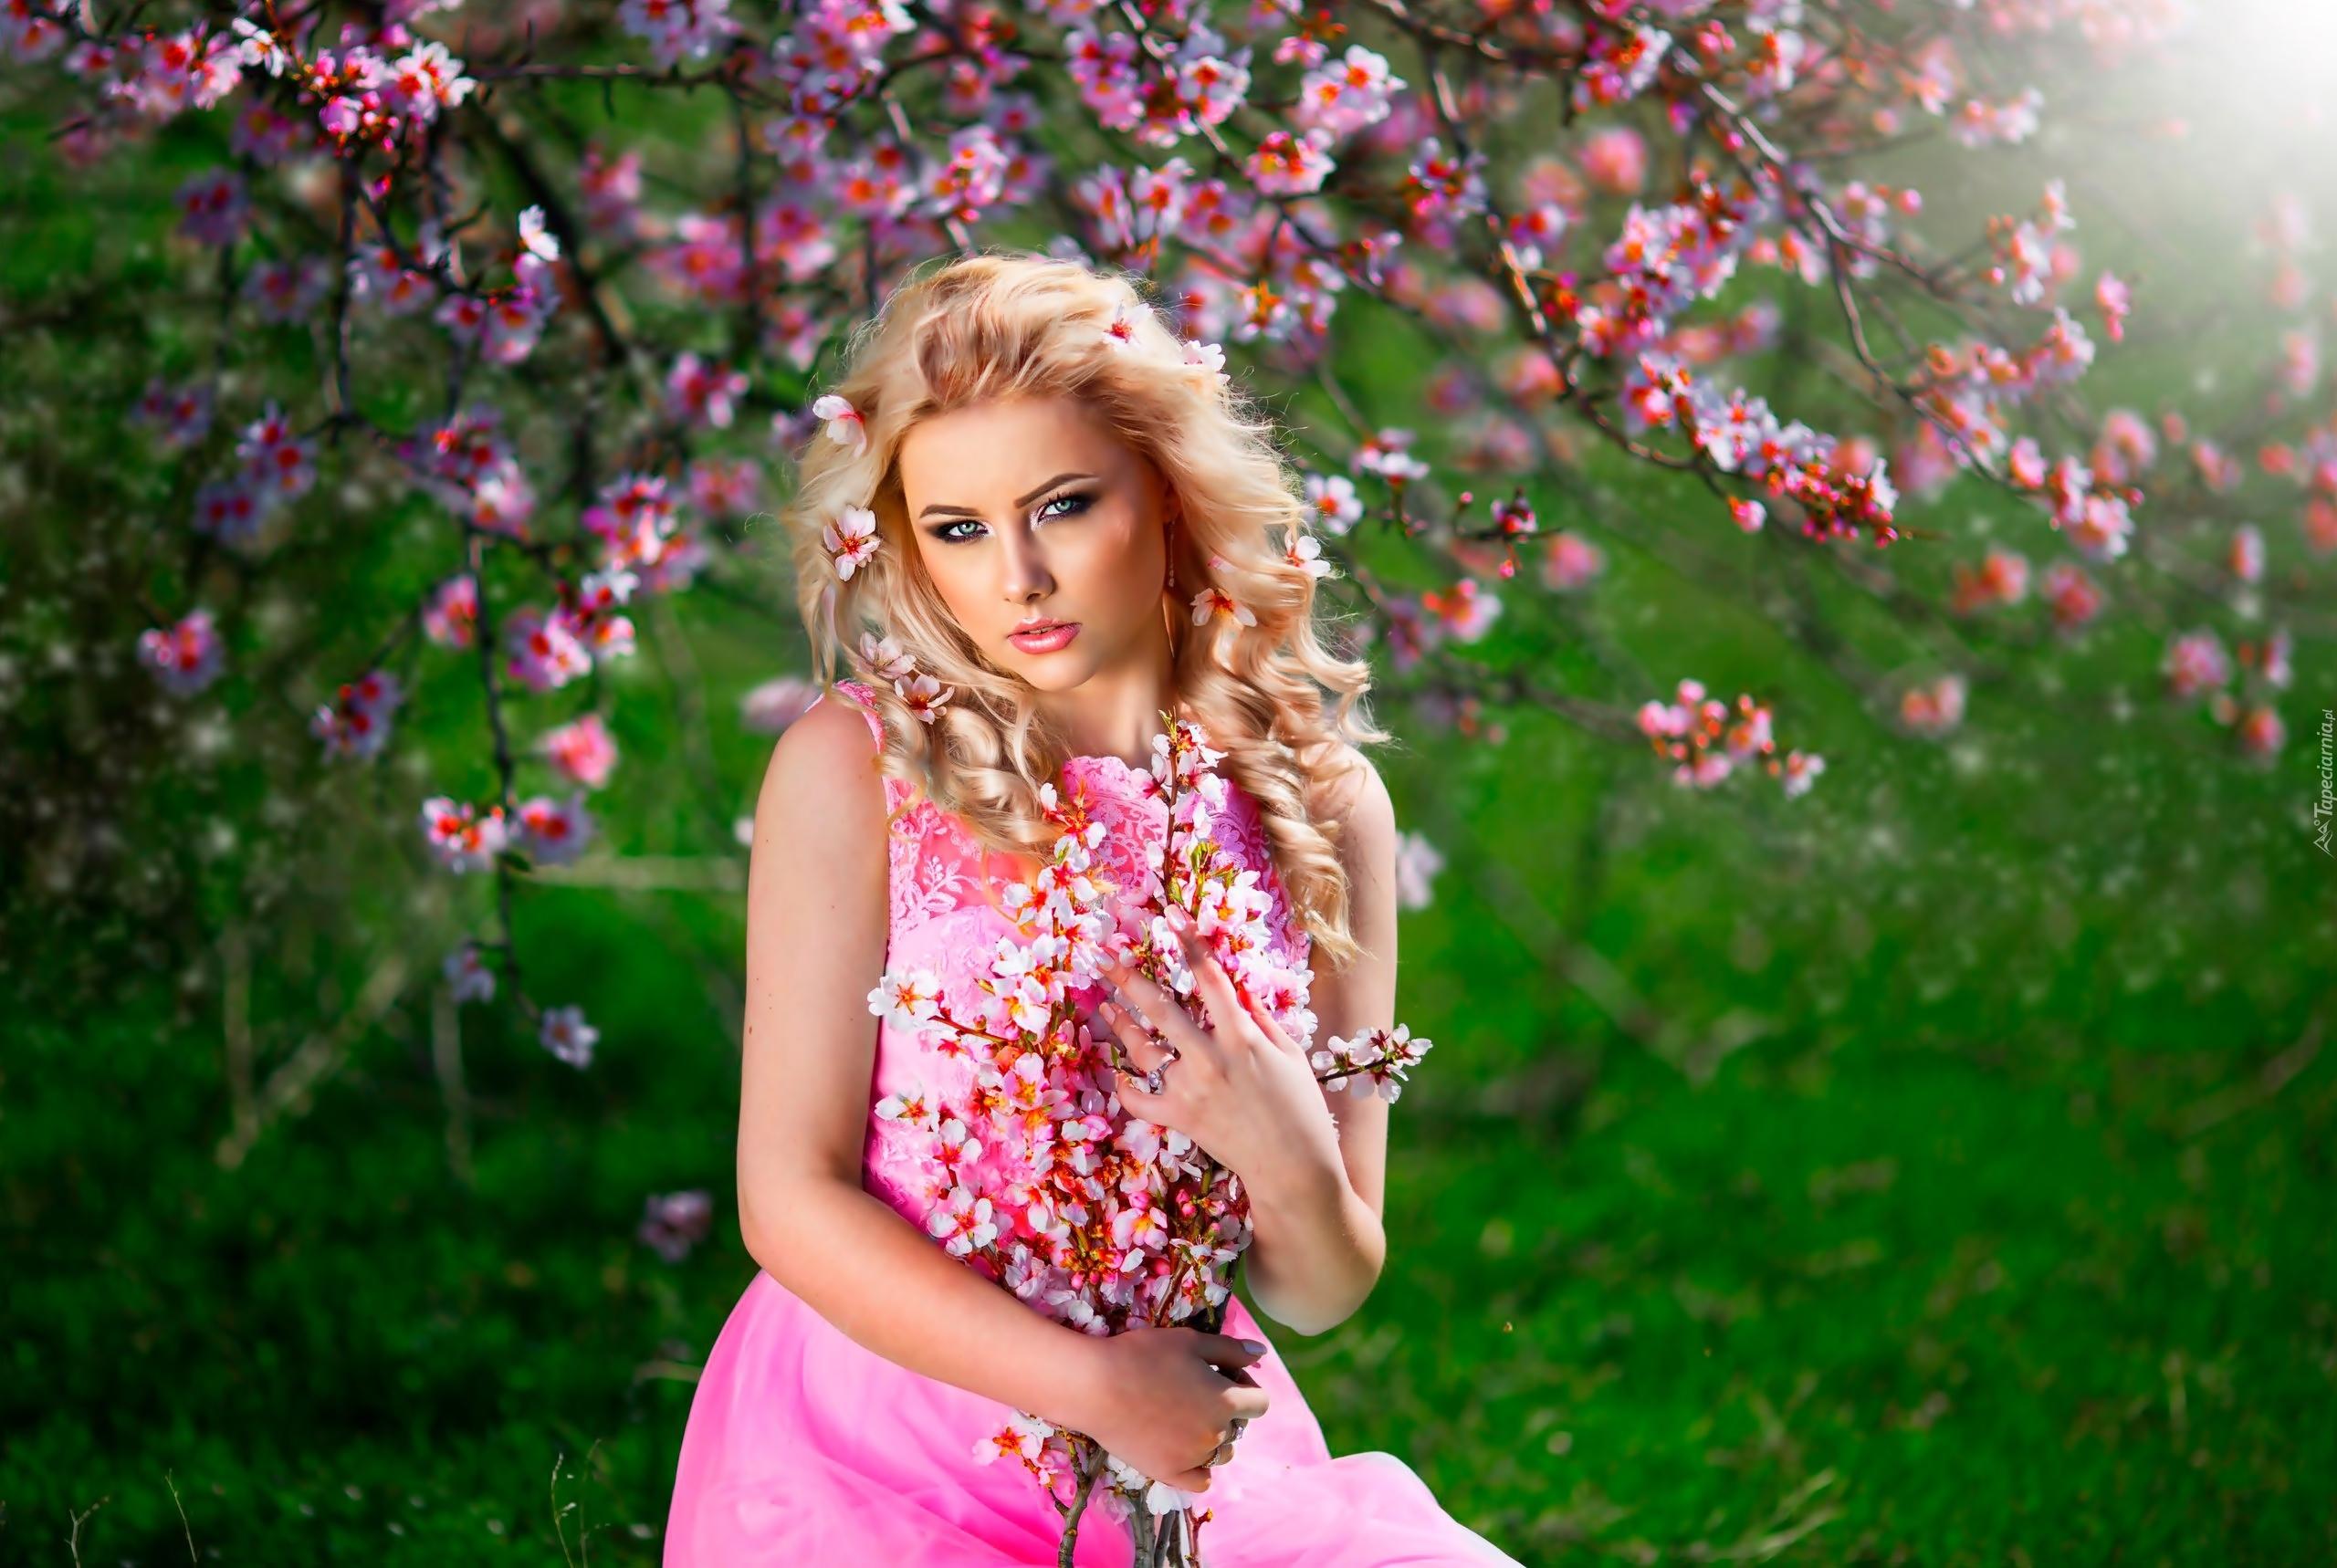 девушка блондинка весна венок цветы бесплатно